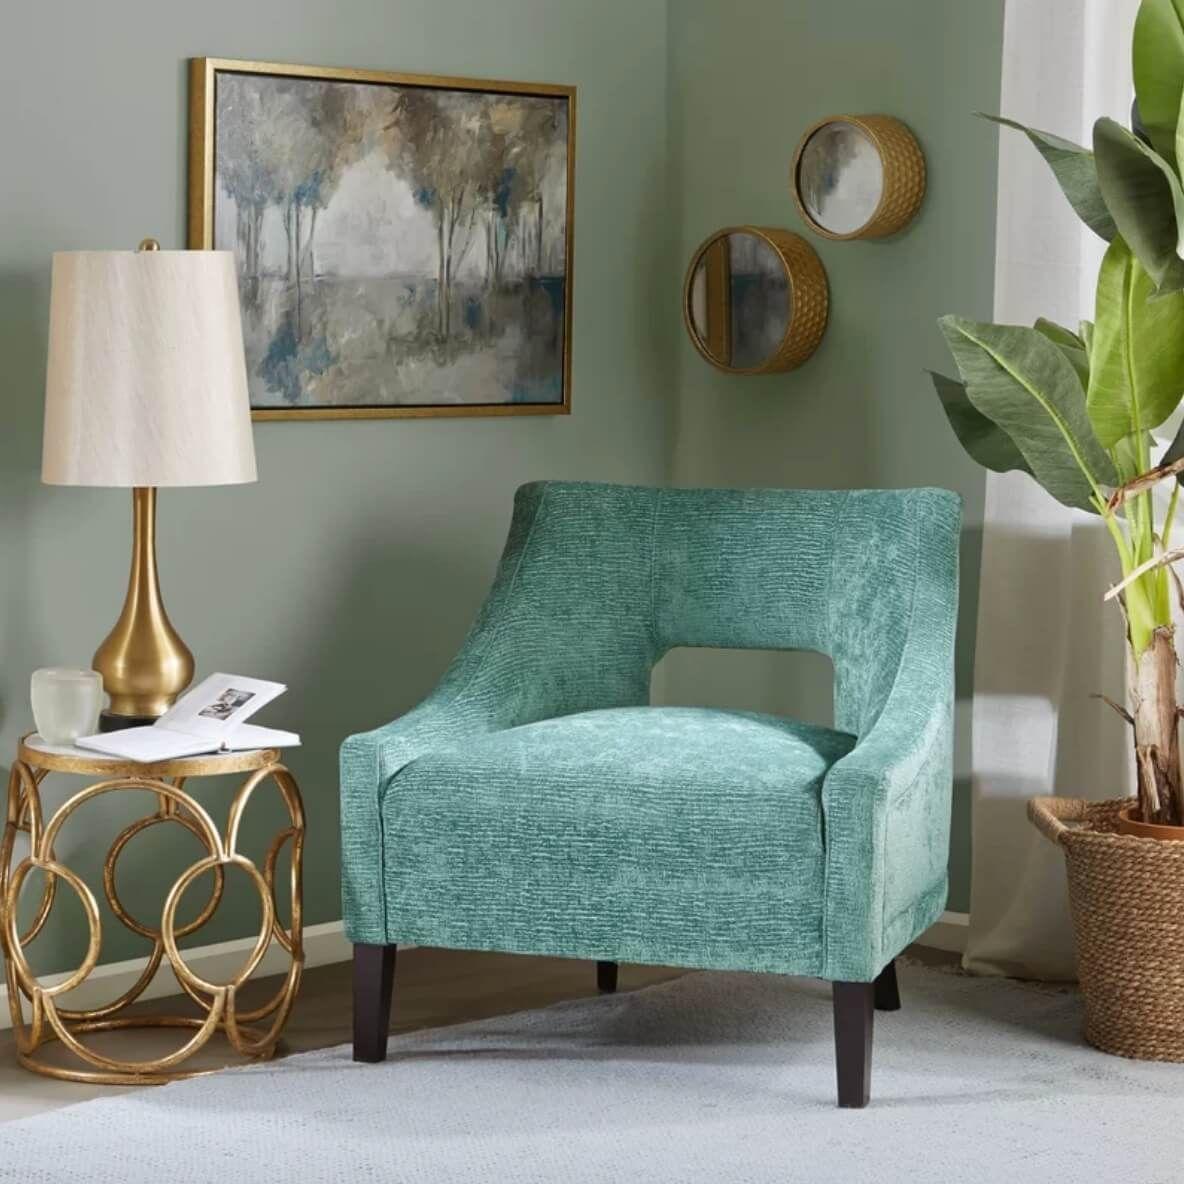 Best Pin By Debashri Samanta On Cosy Corners Living Room 640 x 480